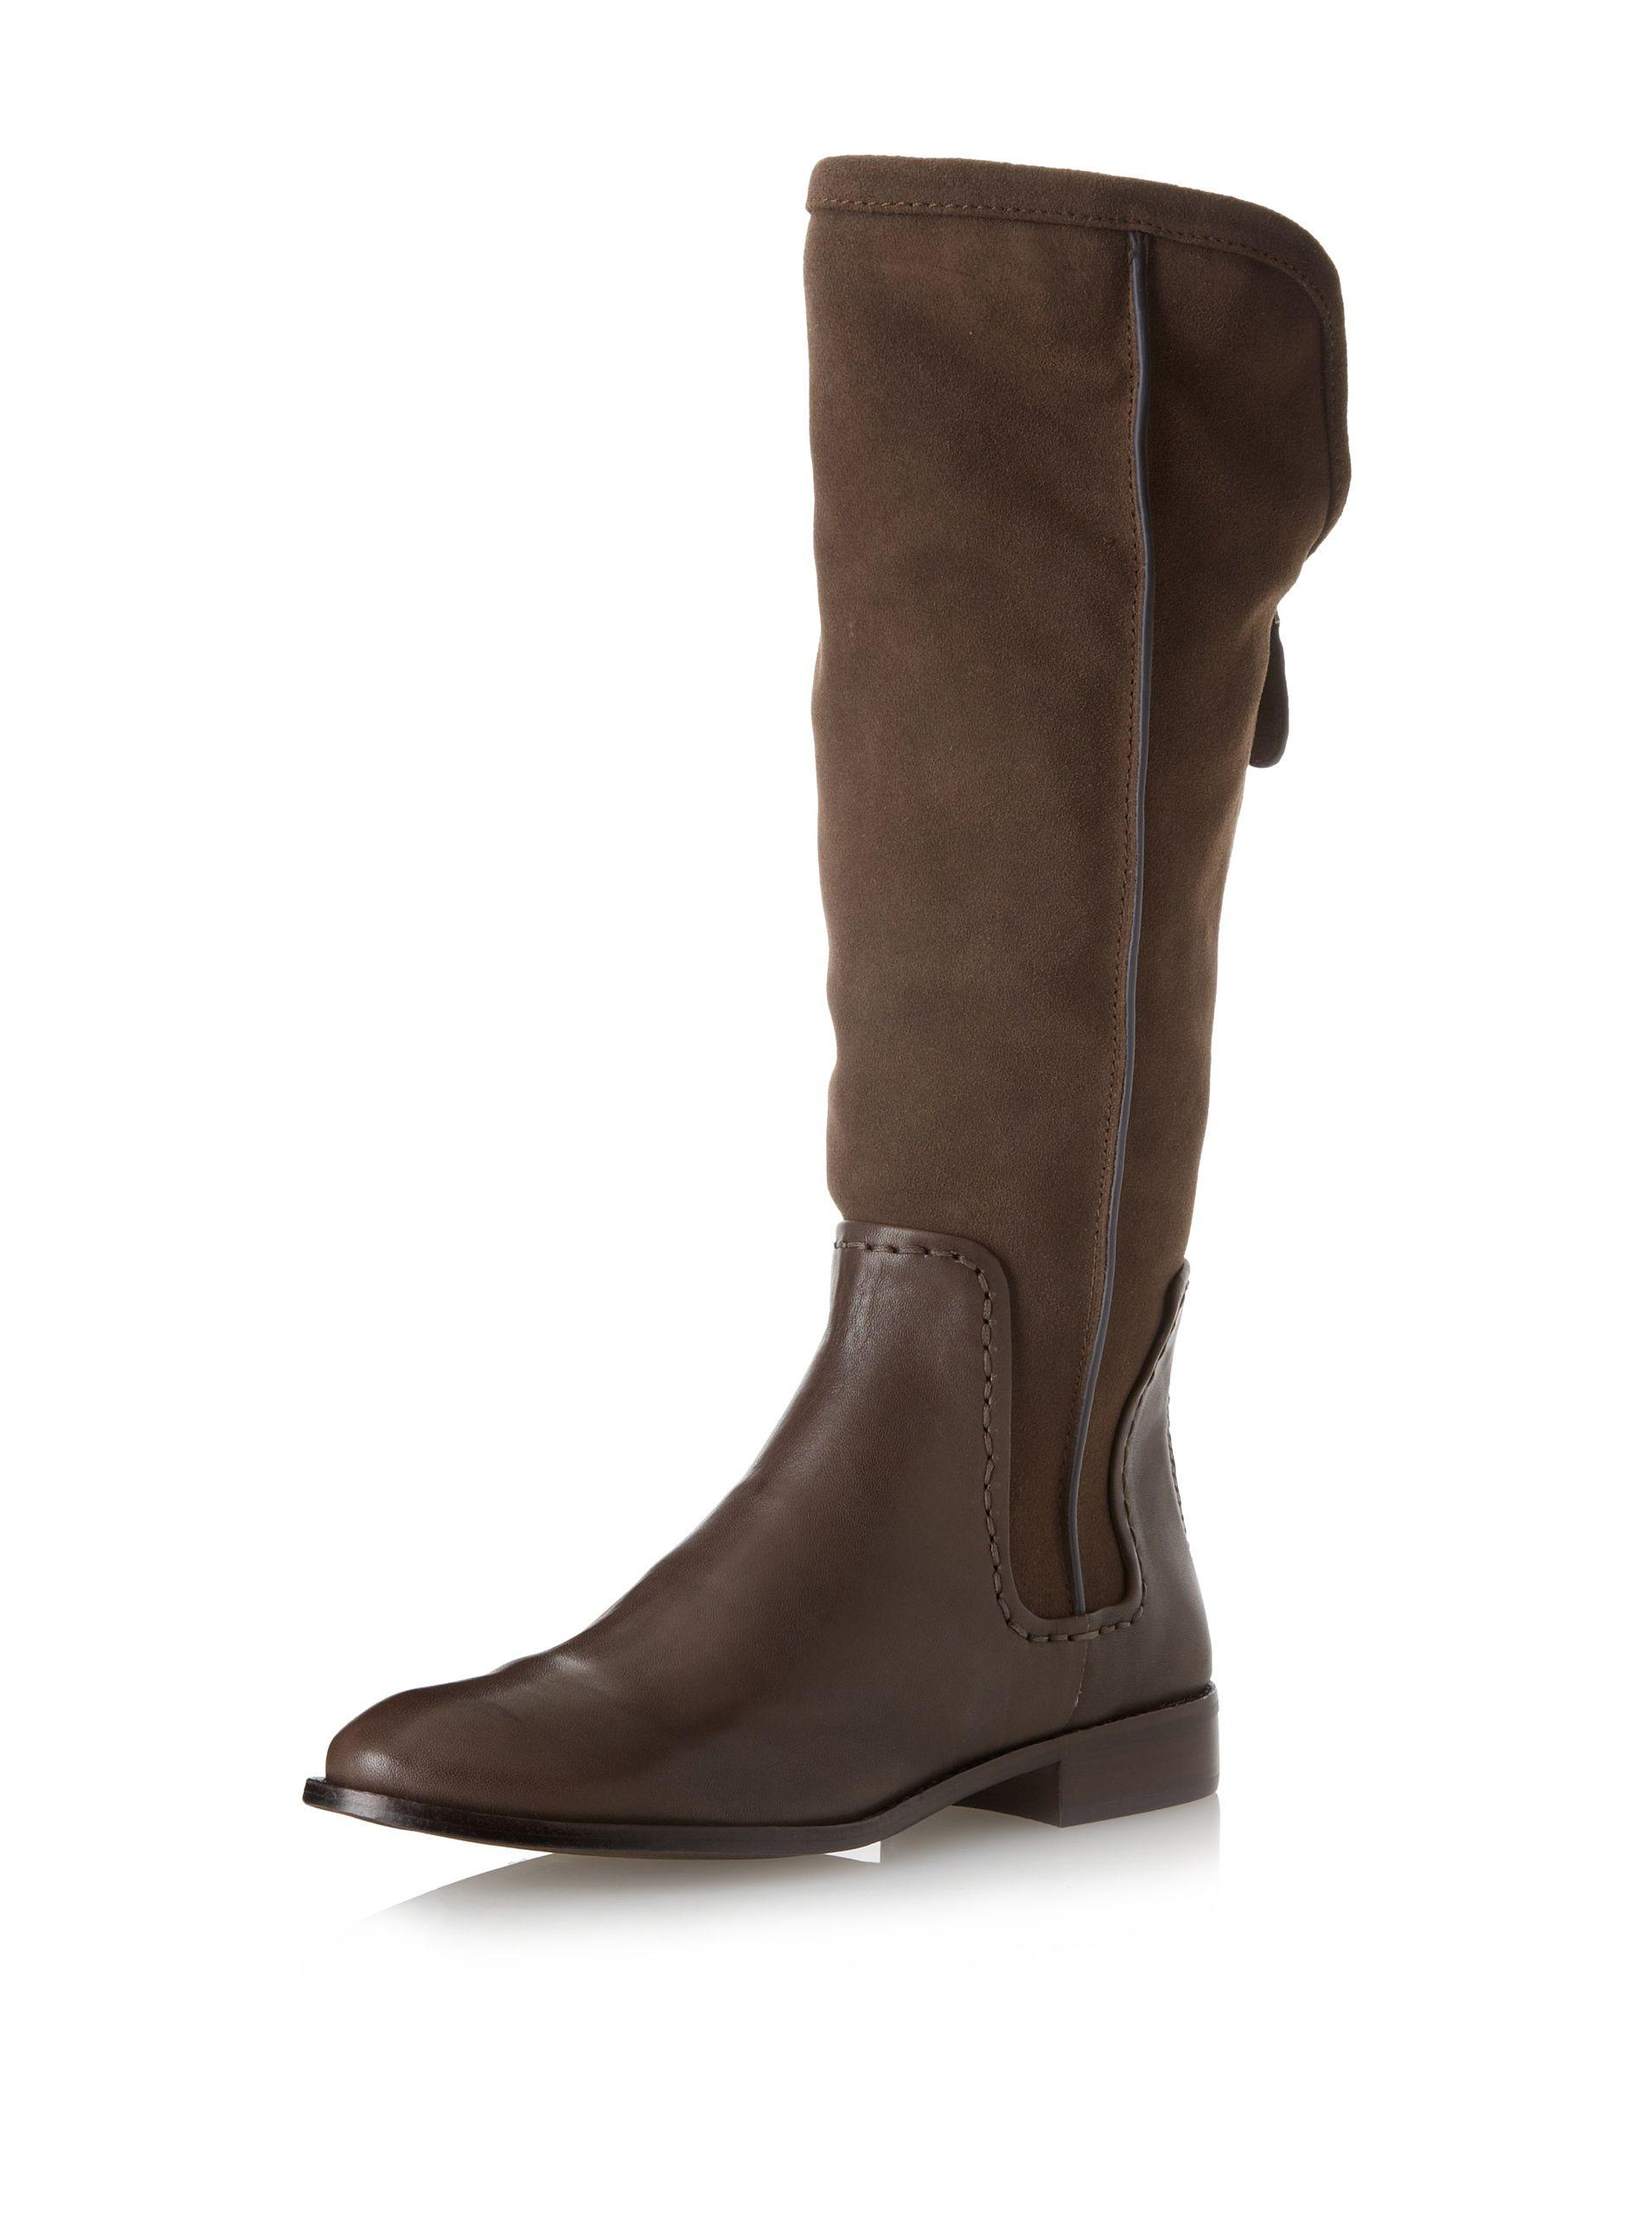 Splendid Women Riding boots, Fashion, Boots